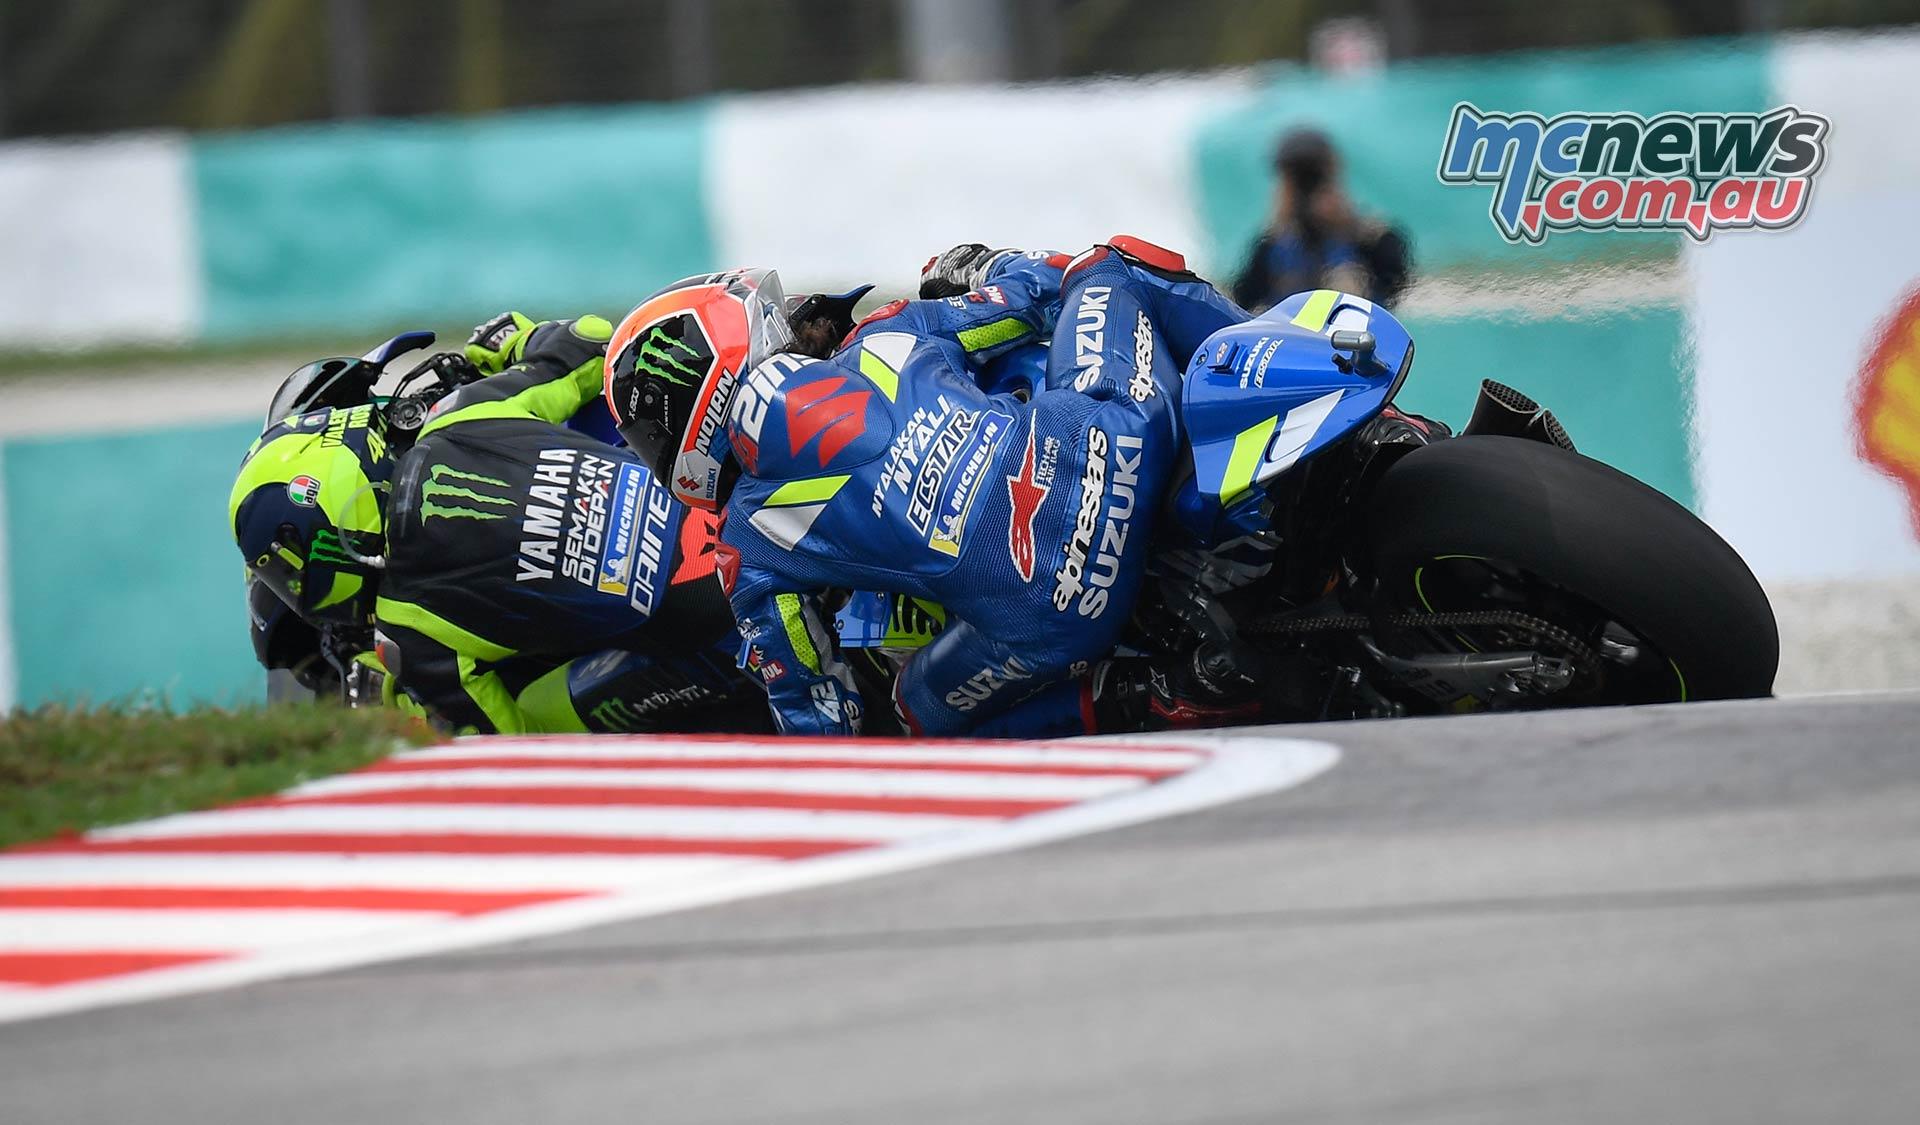 MotoGP Rnd Malaysia Rossi Rins